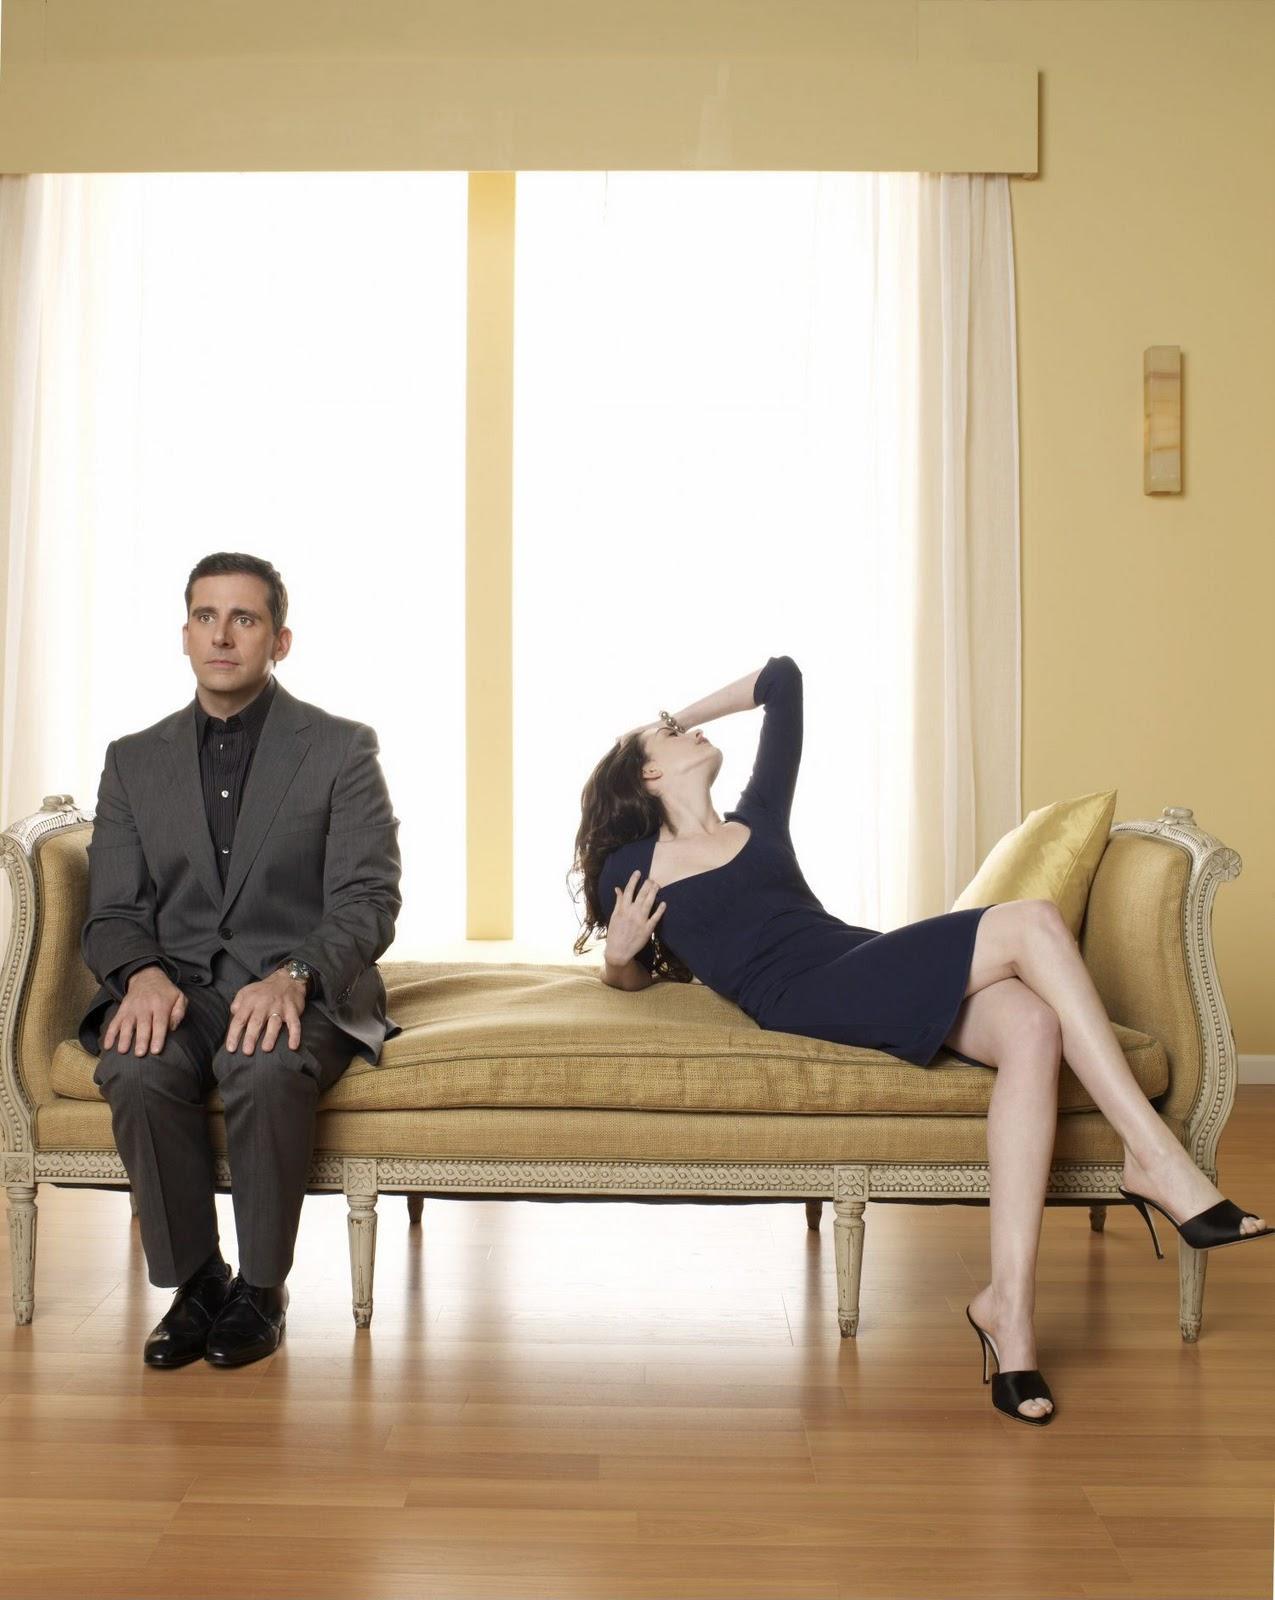 http://4.bp.blogspot.com/-rob__YComRA/Tw8scyHxufI/AAAAAAAAJd4/fKkoc9A2os8/s1600/Anne+Hathaway+-+Get+Smart+-+Promo+Photo+a13.jpg